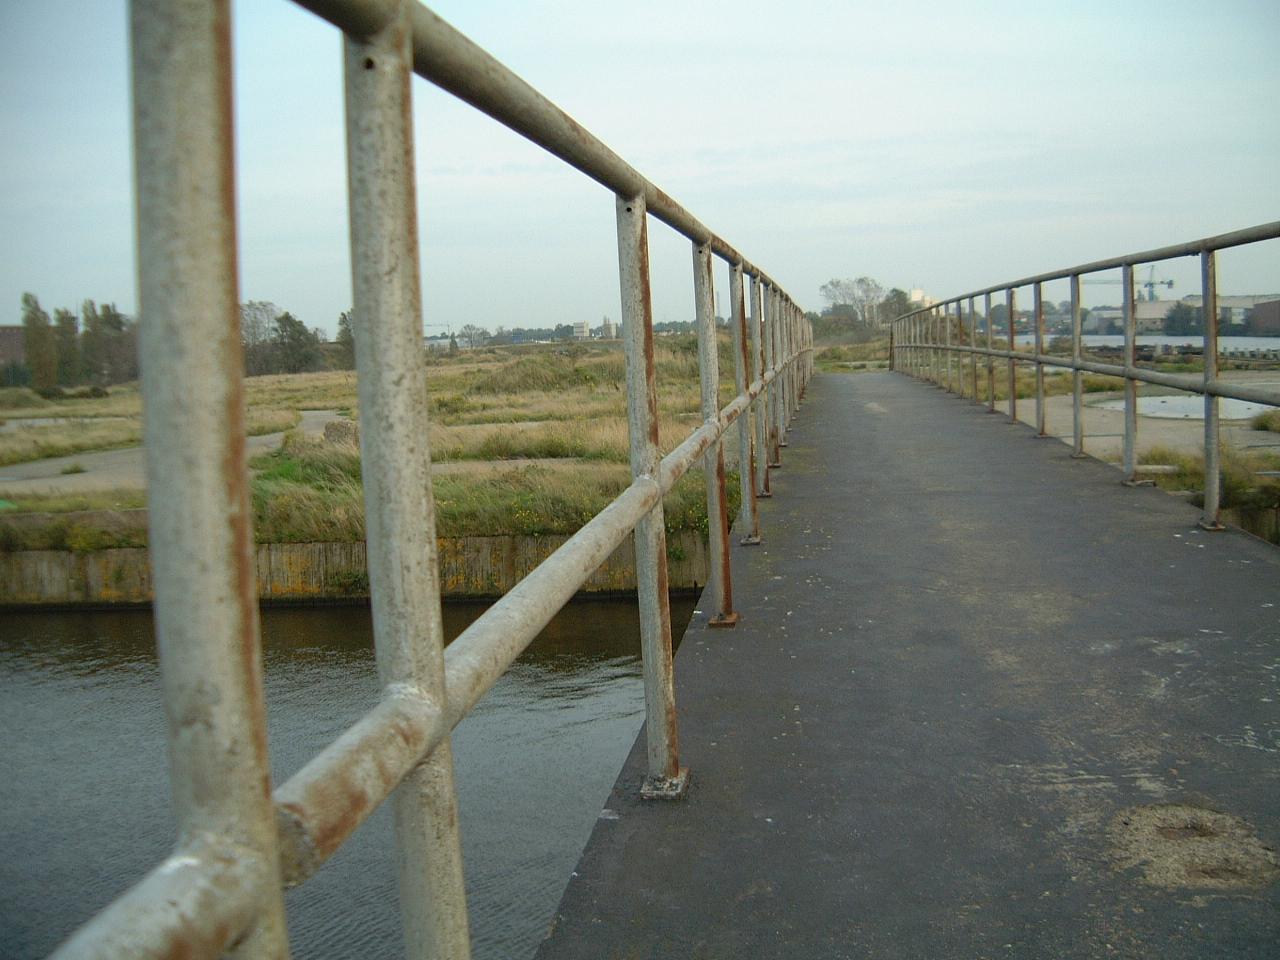 maartent bridge railing railings old metal rust